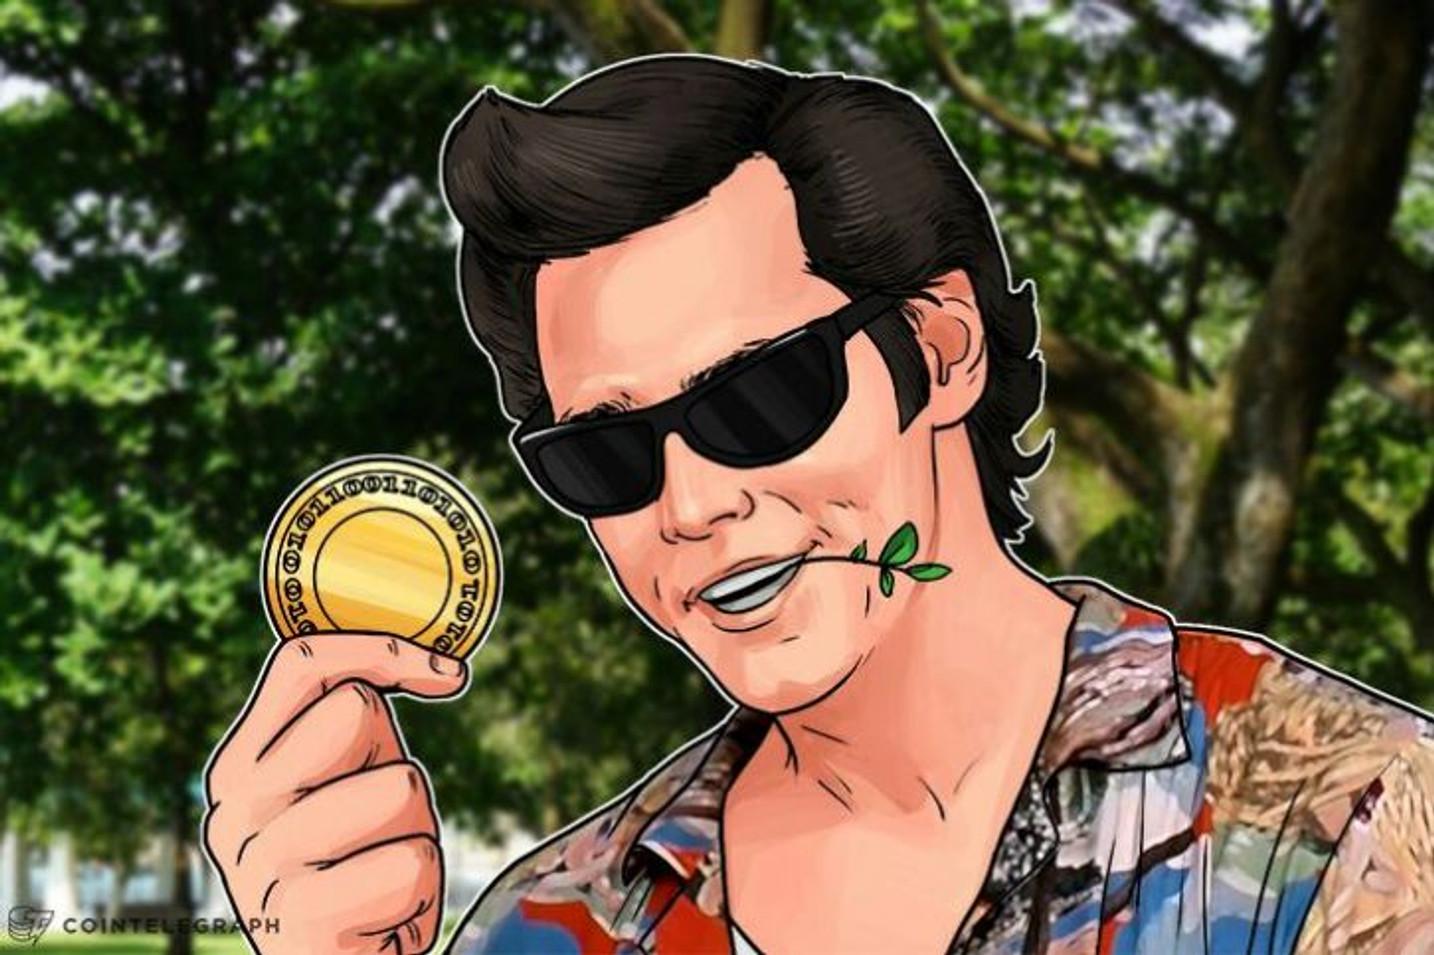 Iznenada Biomimetika je predložena kao rešenje za bitkoinov problem skaliranja